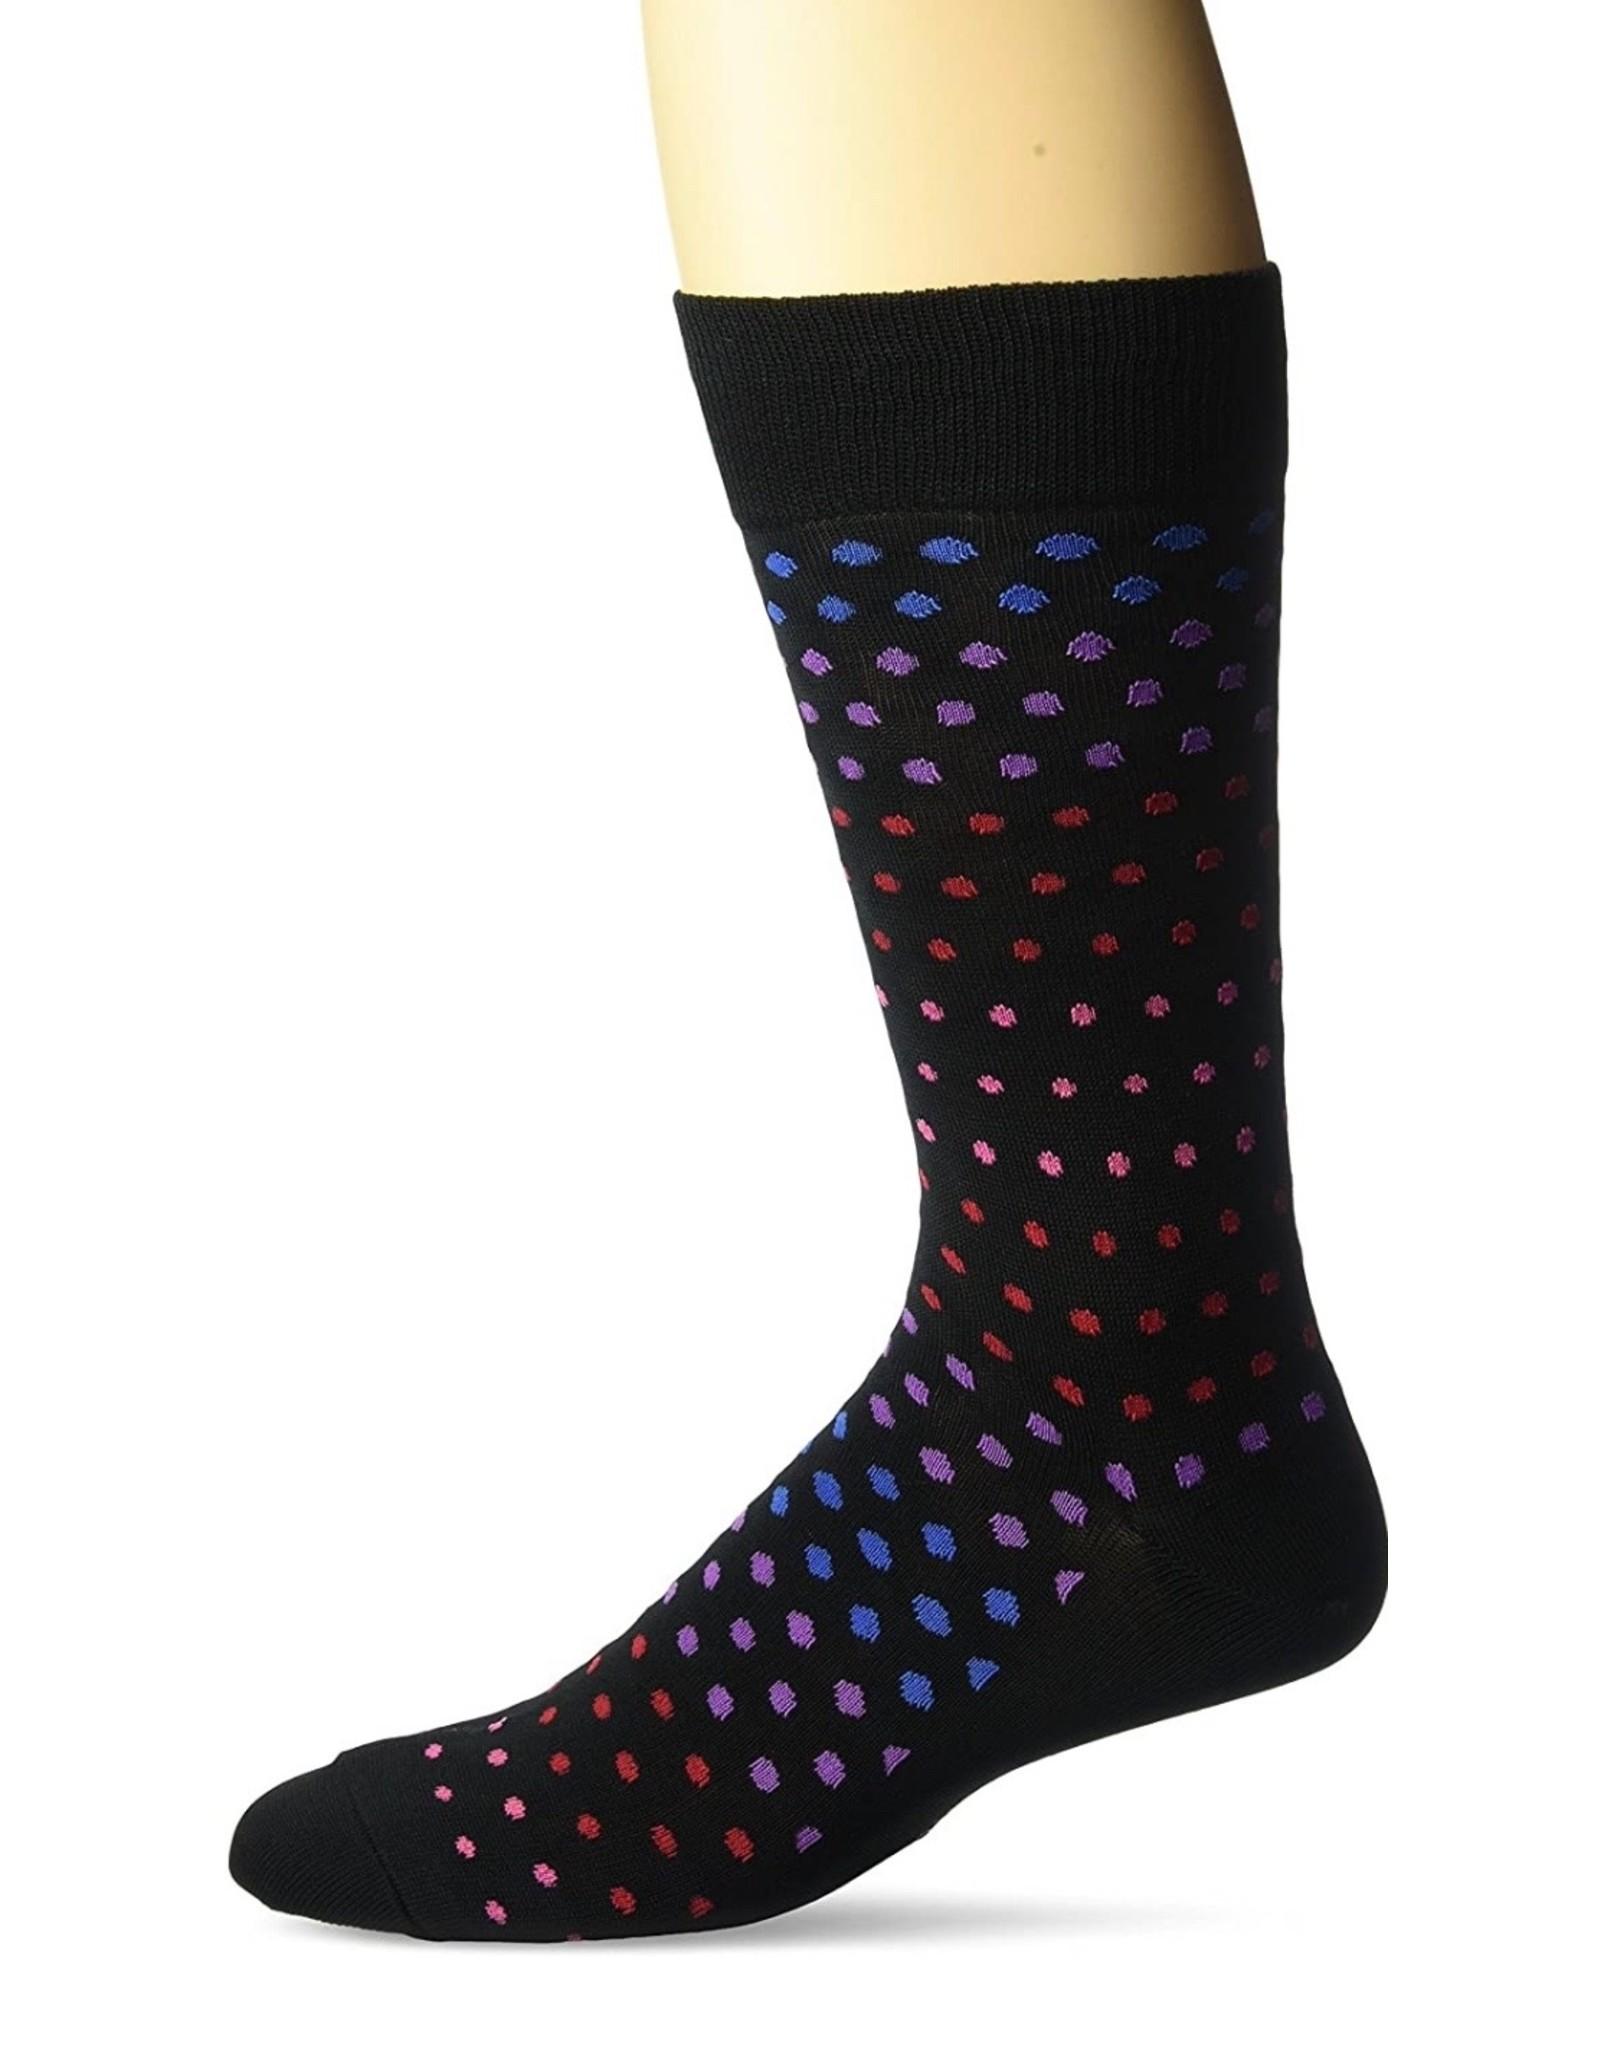 Hotsox Hotsox Men's Variegated Dot Crew Socks HM100085